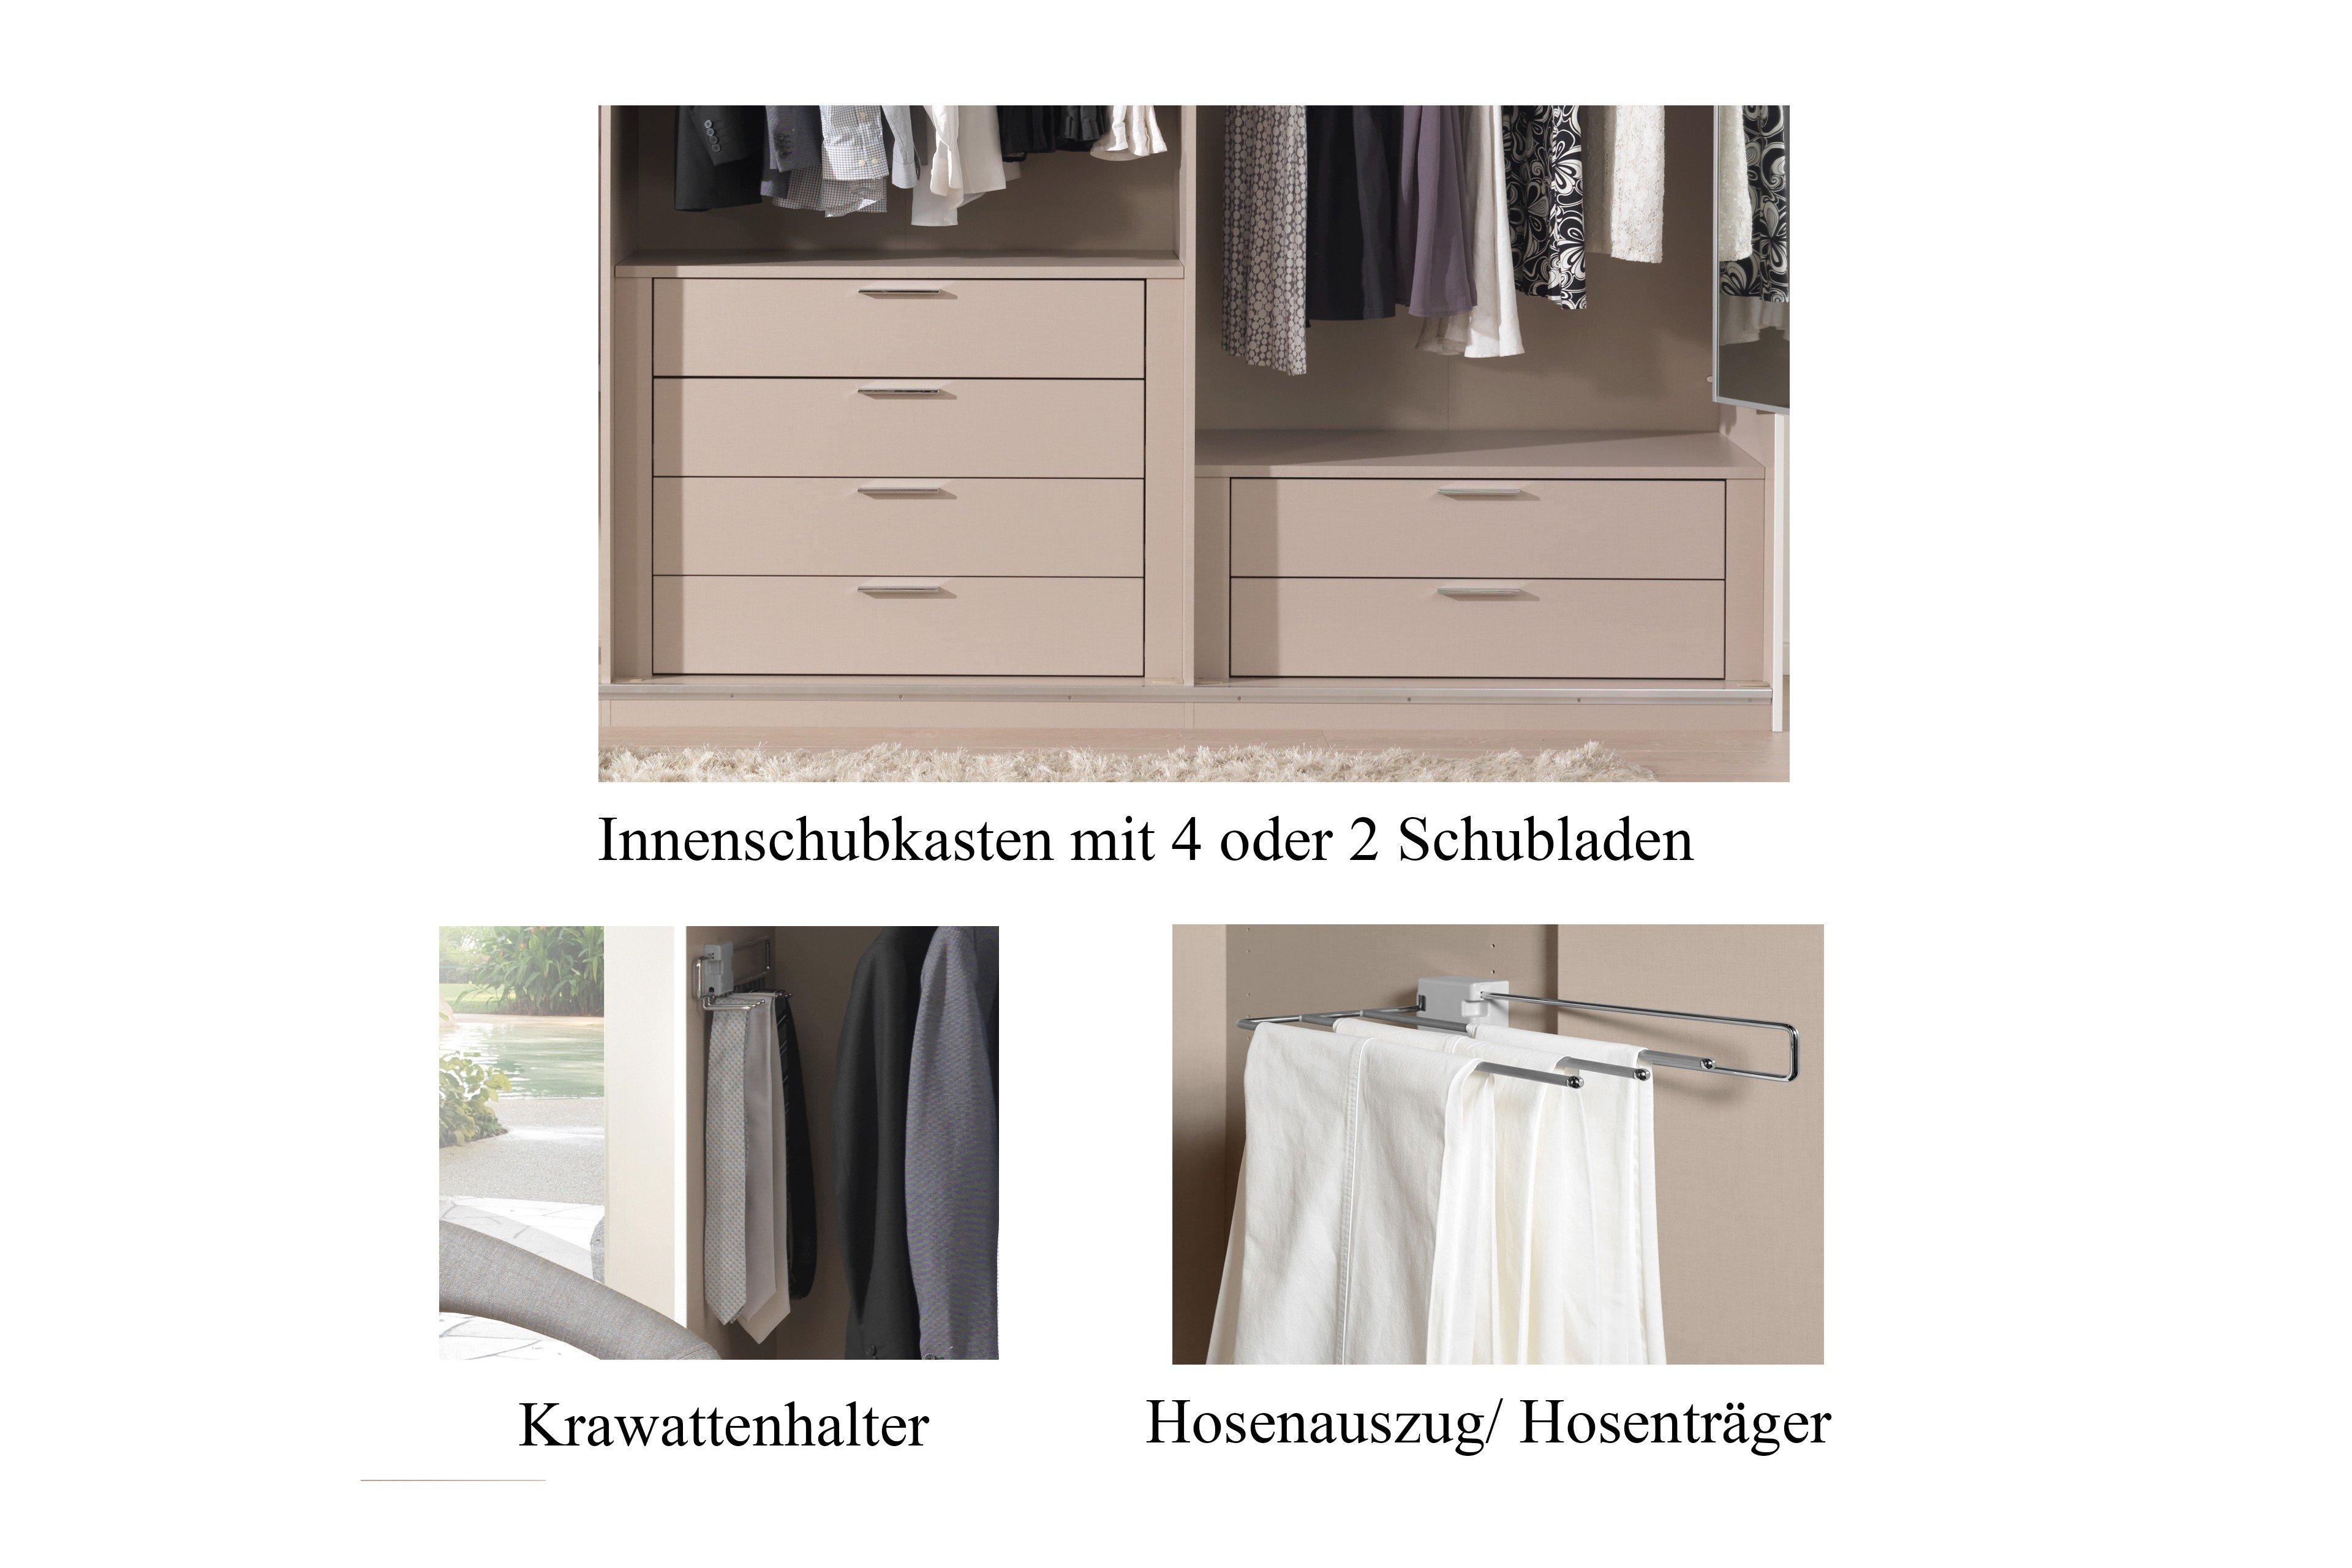 Tolle Wellemöbel Insua Ideen - Schlafzimmer Ideen - jasaekspedisi.net